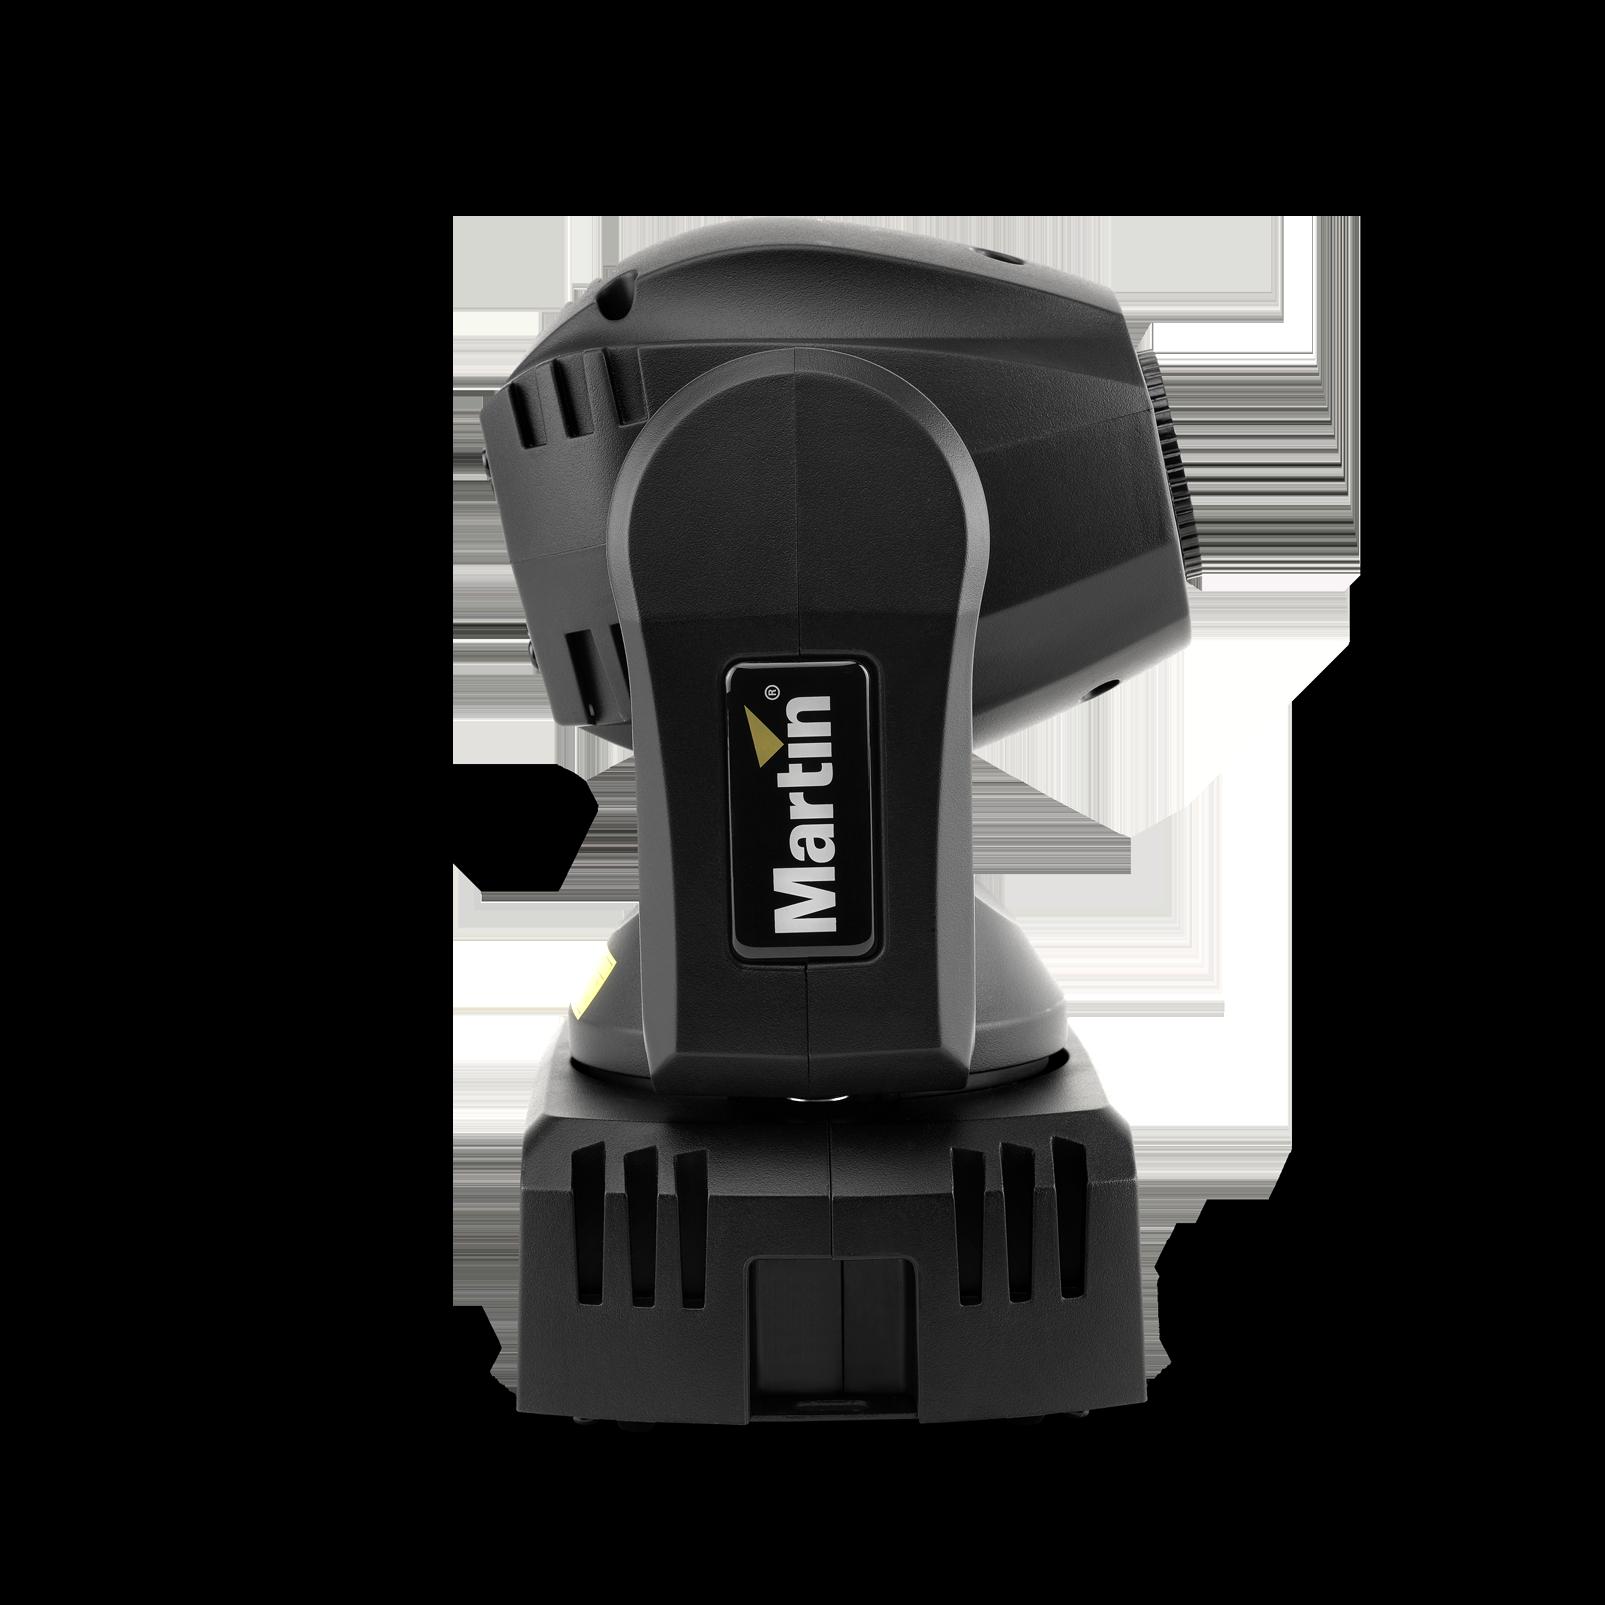 THRILL Mini Profile - Black - Compact LED Moving Head - Left